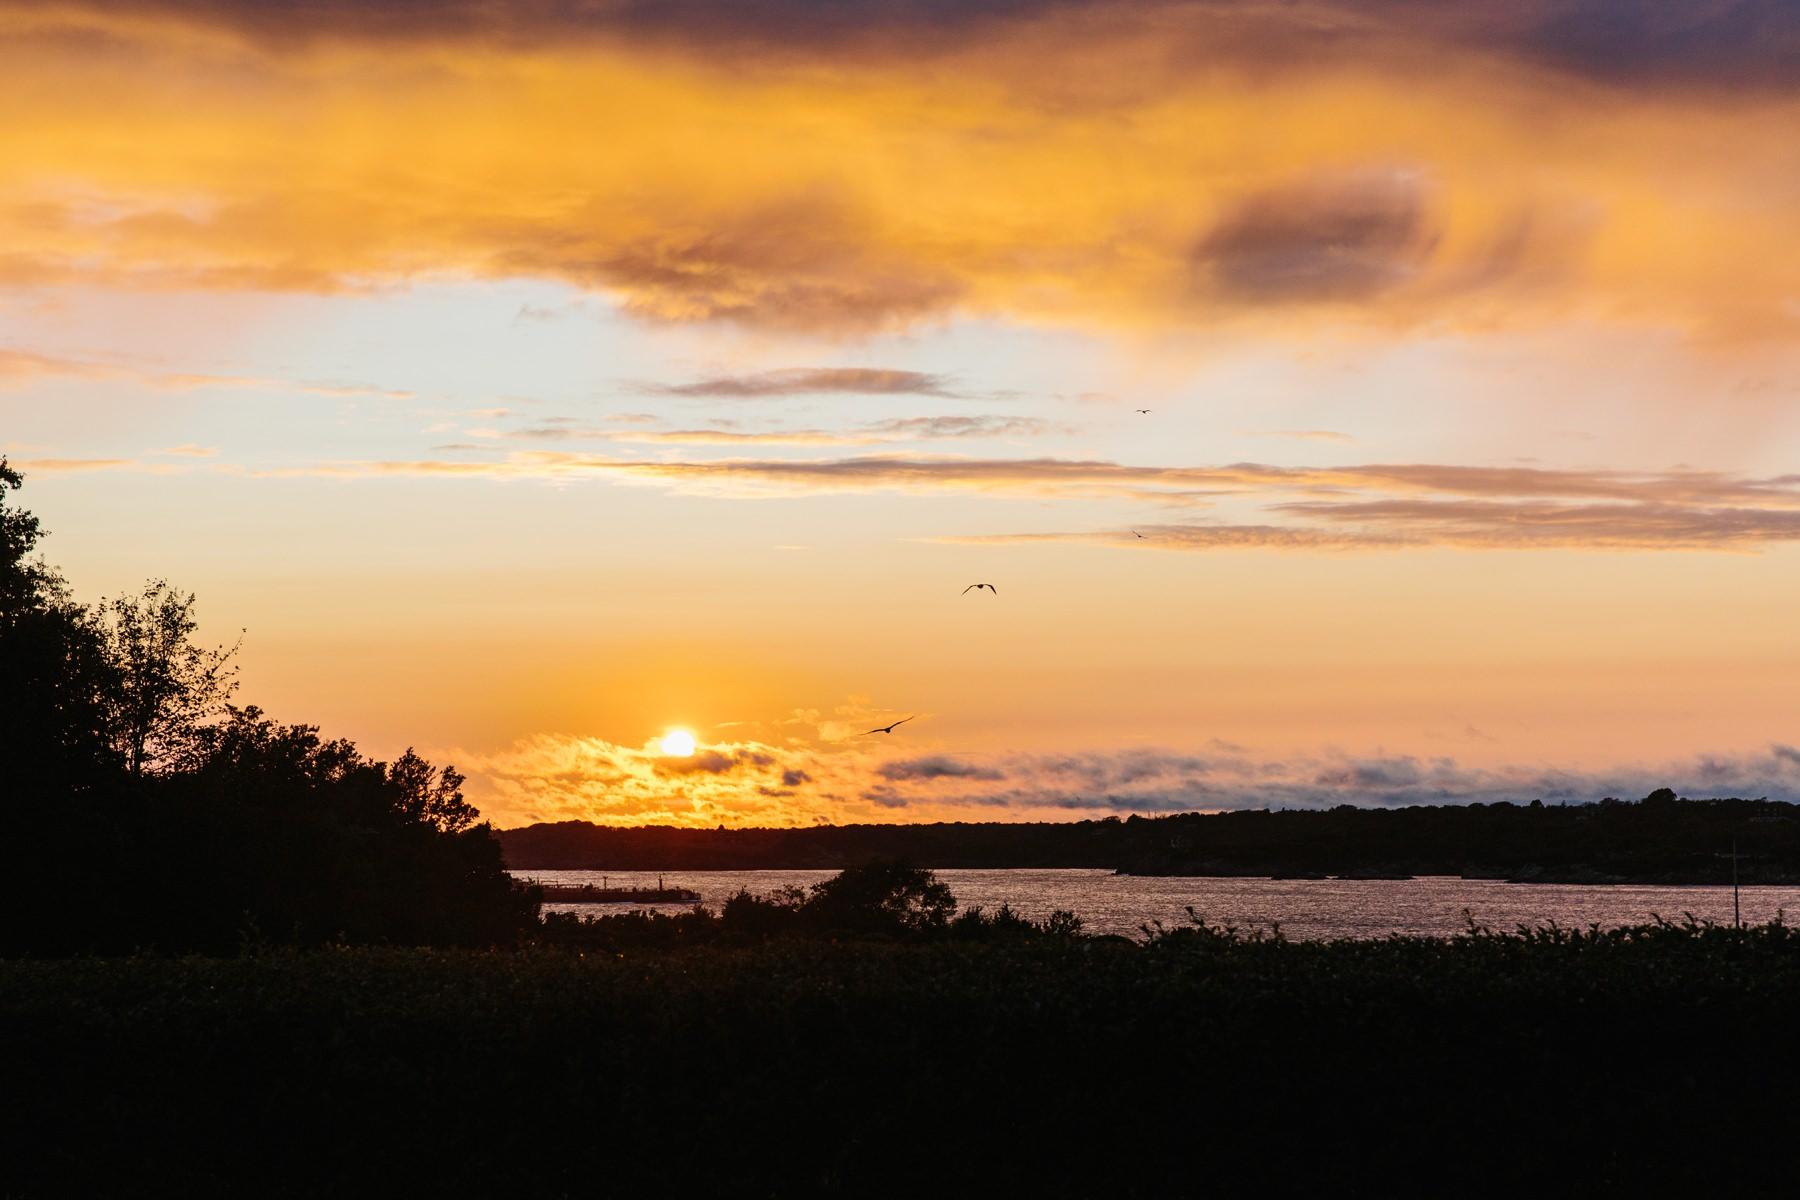 sunset at eisenhower house